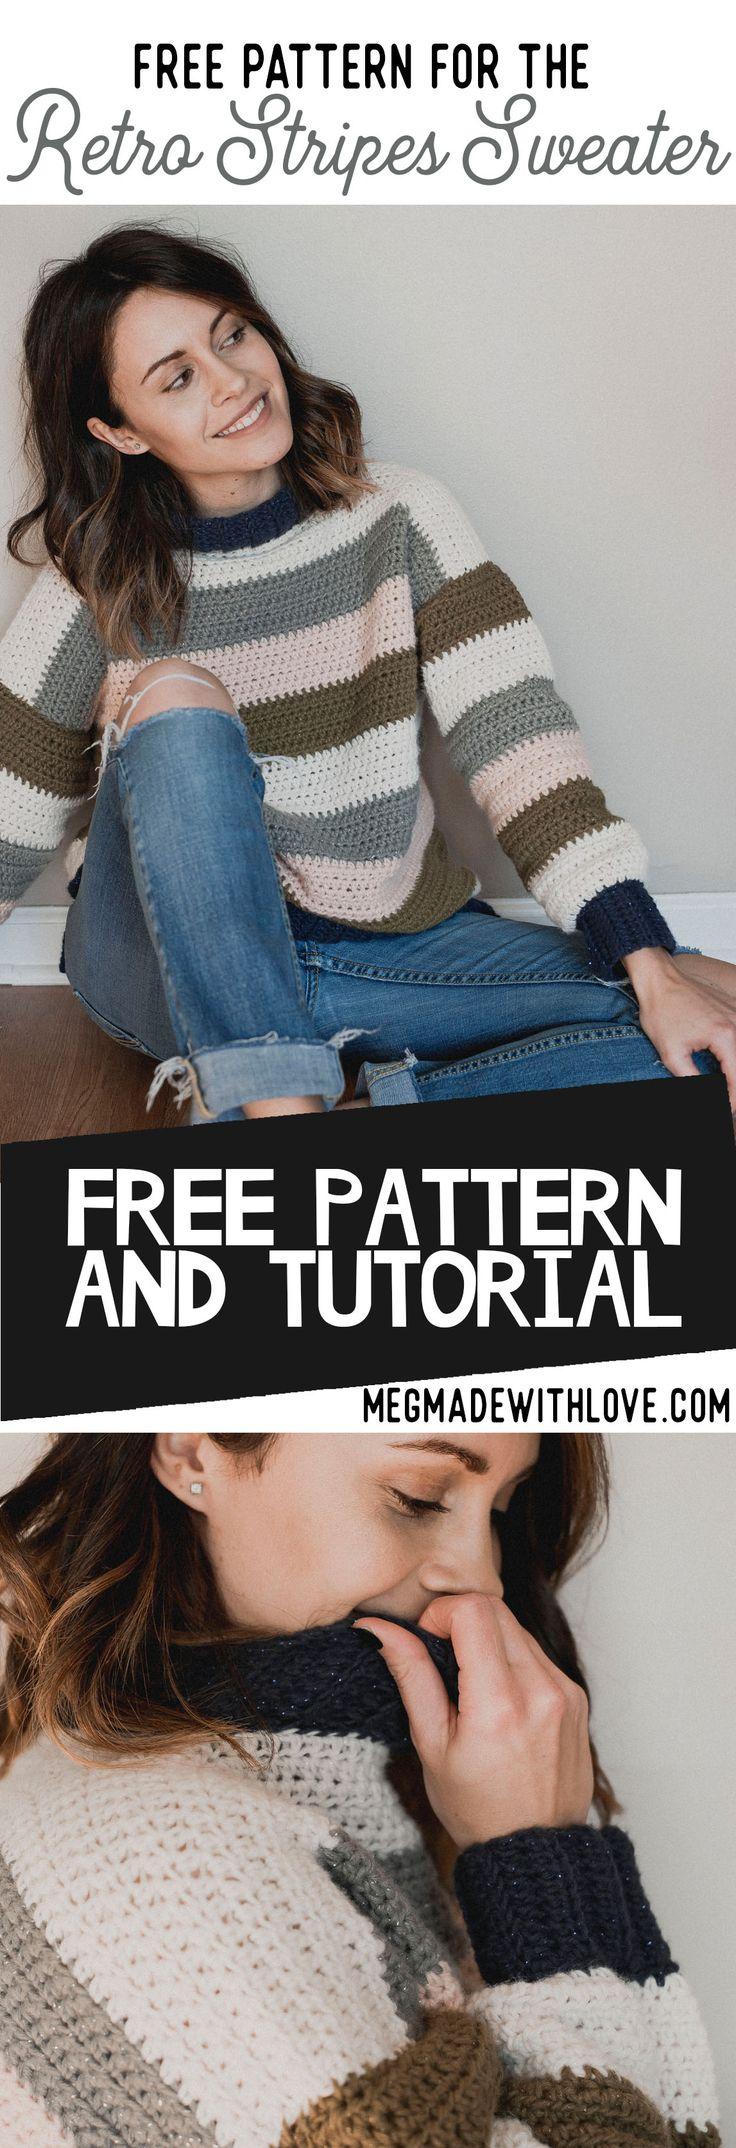 Free Crochet Pattern – Retro Stripes Sweater